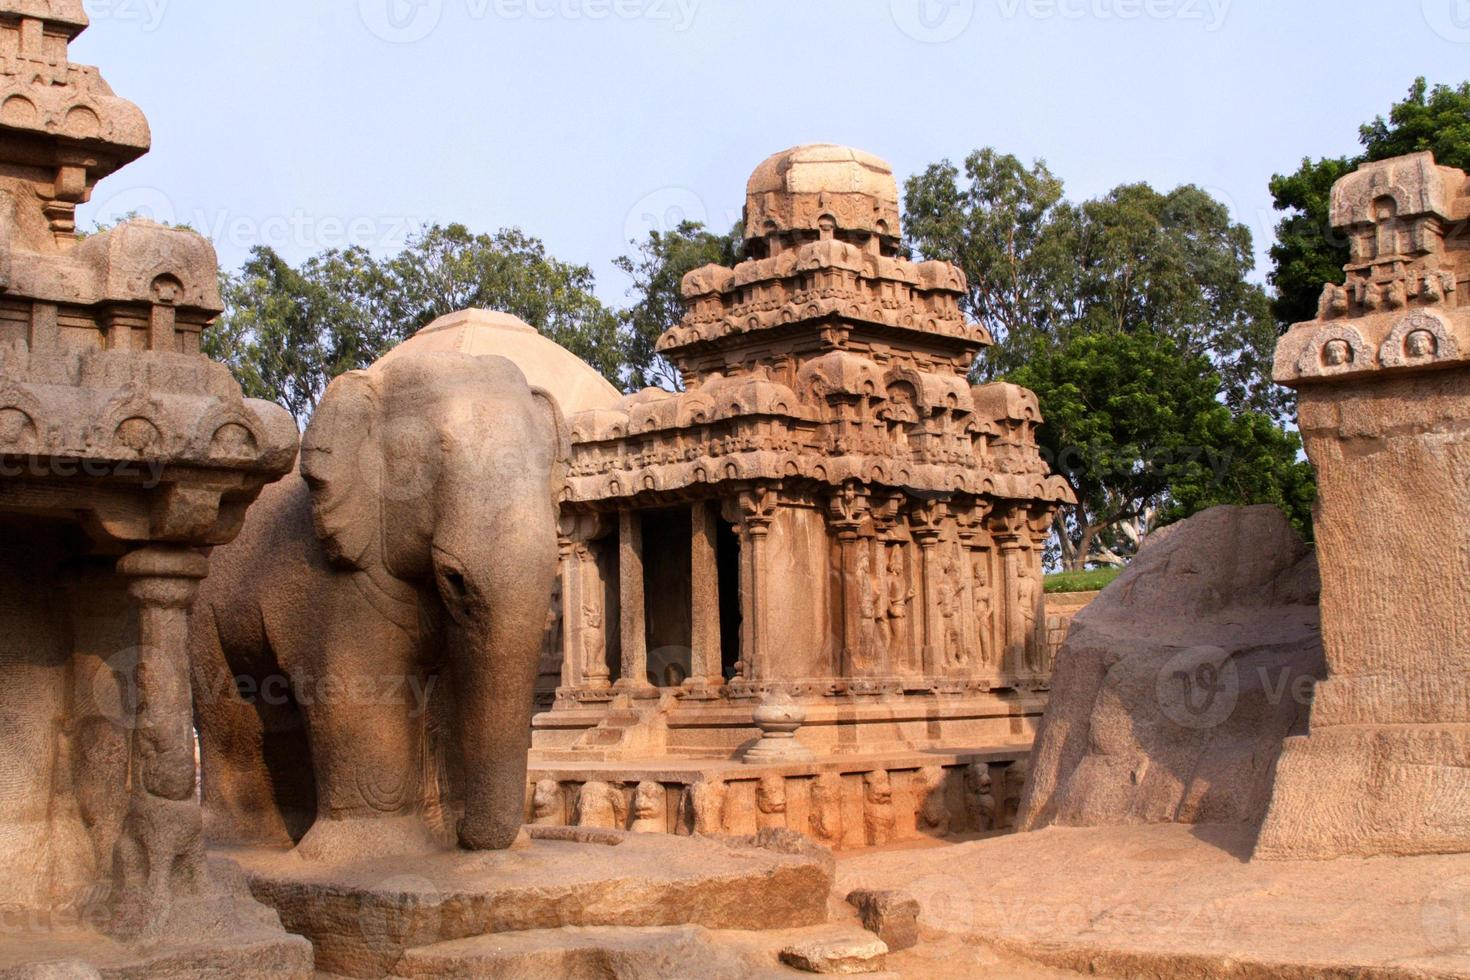 Foto des Pancha Ratha Tempels in Mammallapuram, Indien